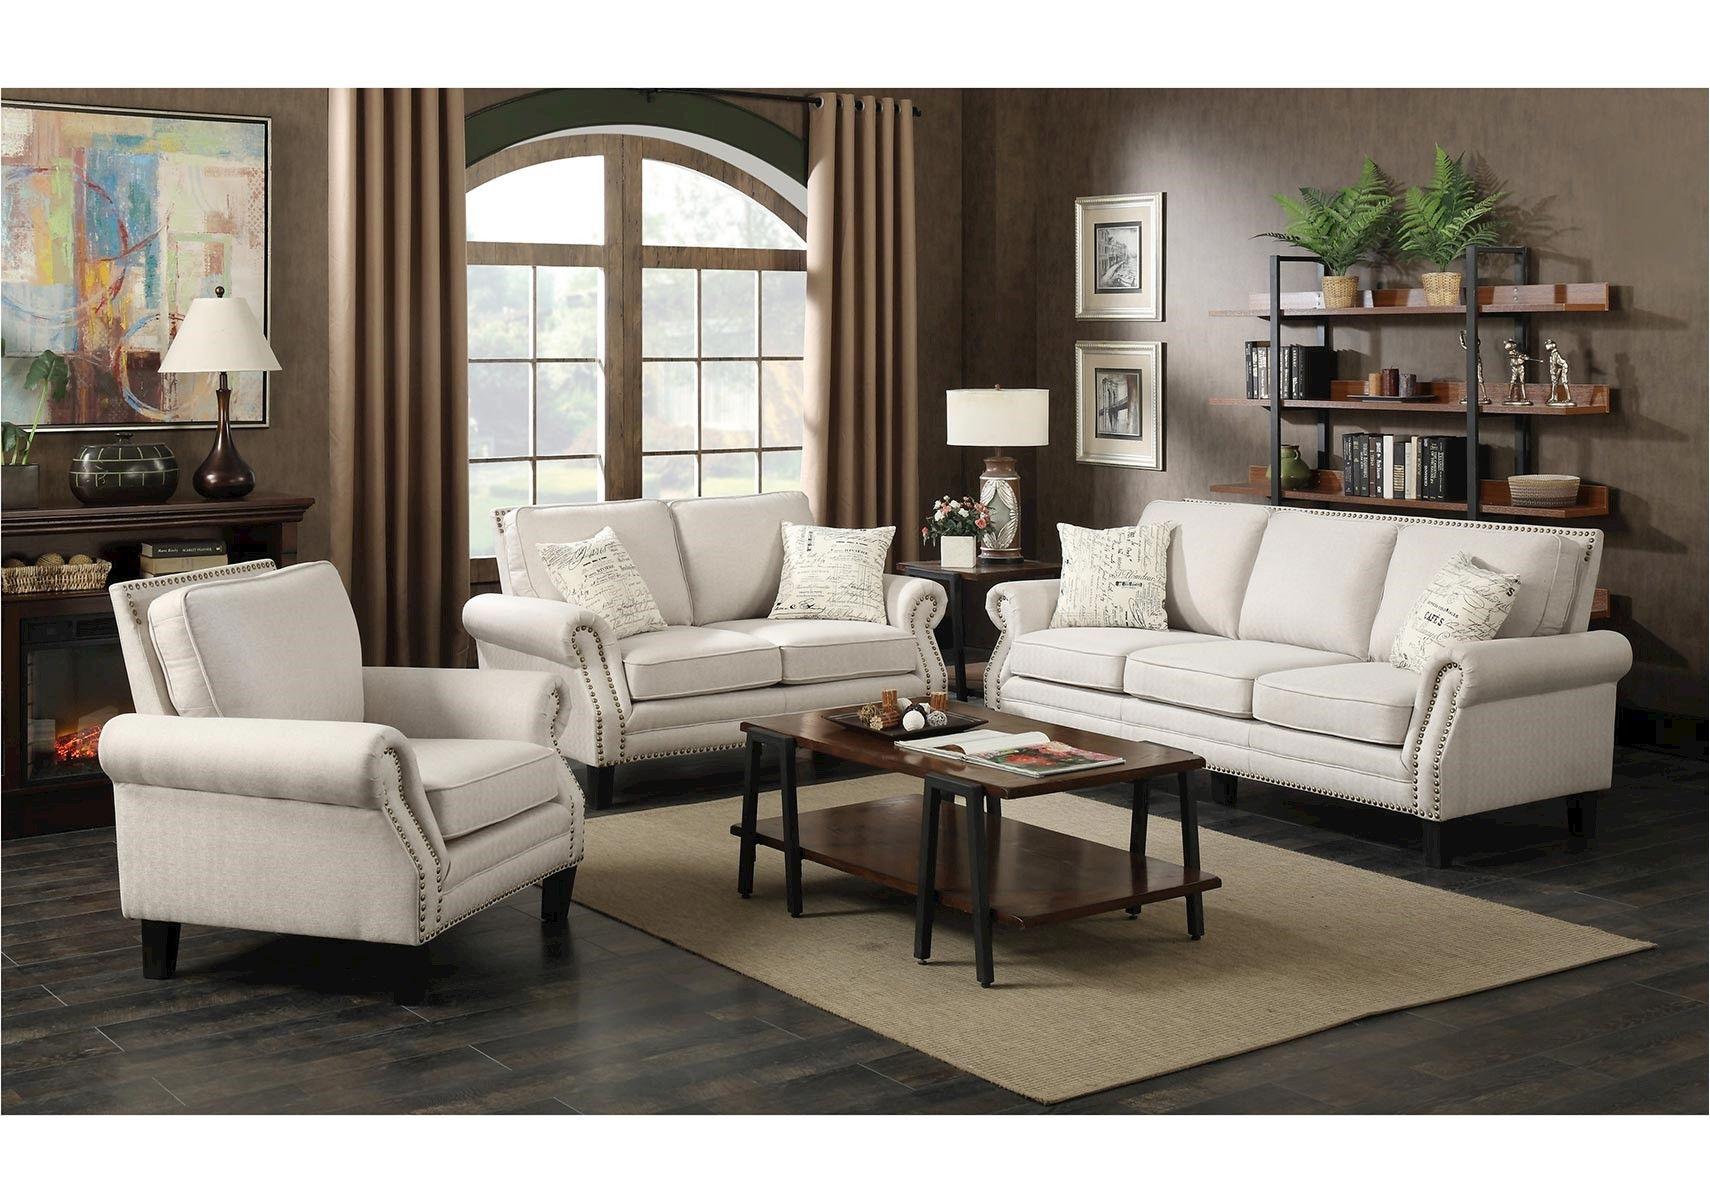 Lacks Yorktown 3 Pc Living Room Set Living Room Sets Living Room Furniture Living Furniture 3 pc living room set